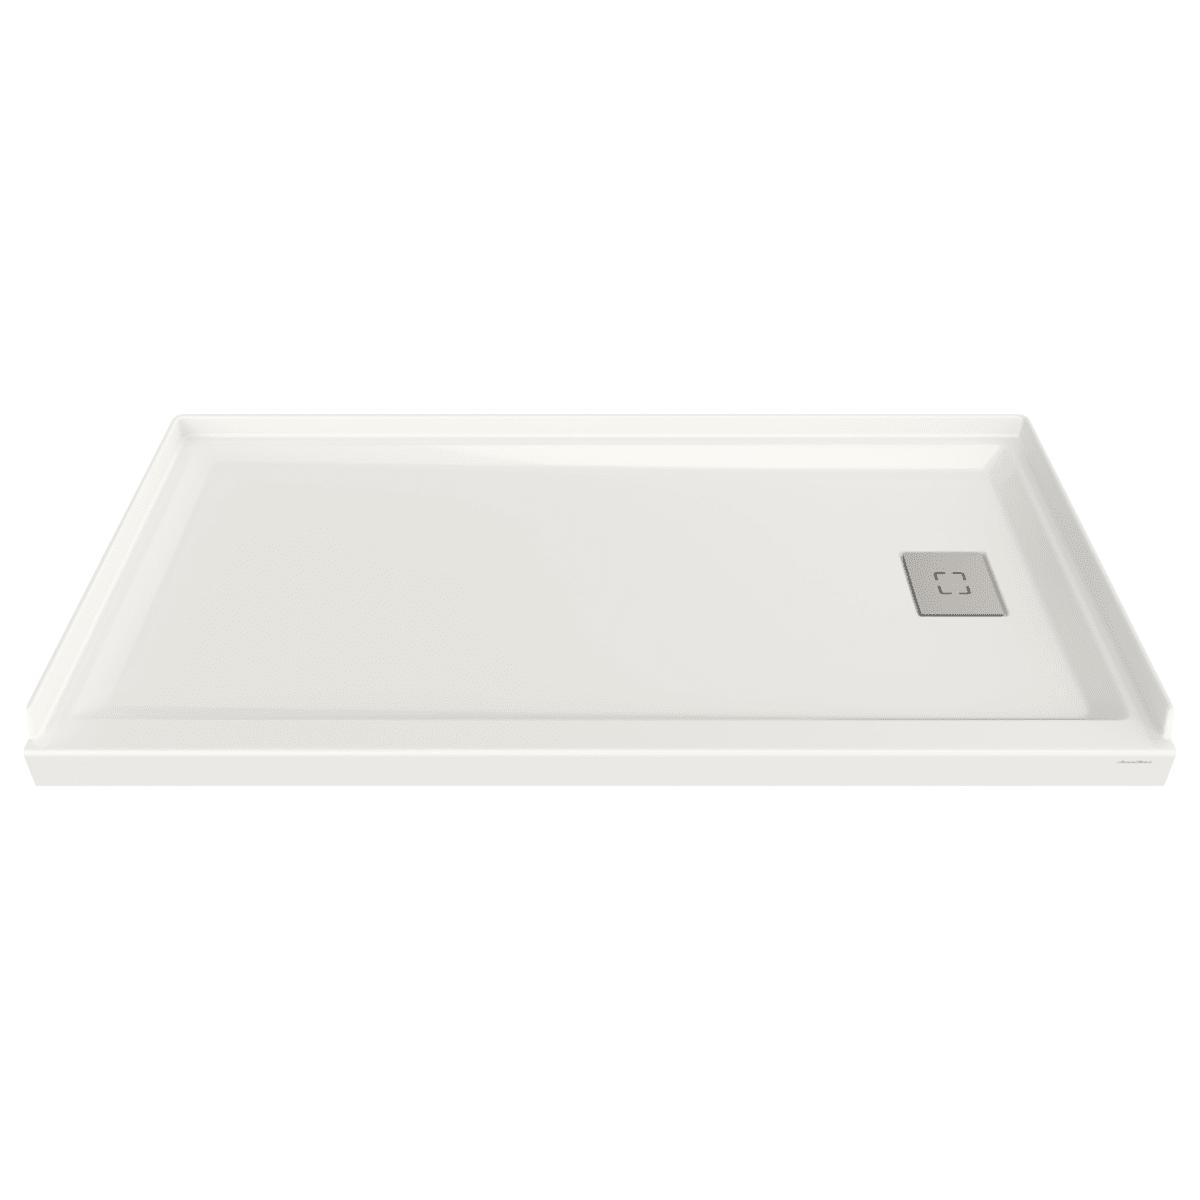 American Standard A8002l Rho Shower Base Acrylic Shower Base